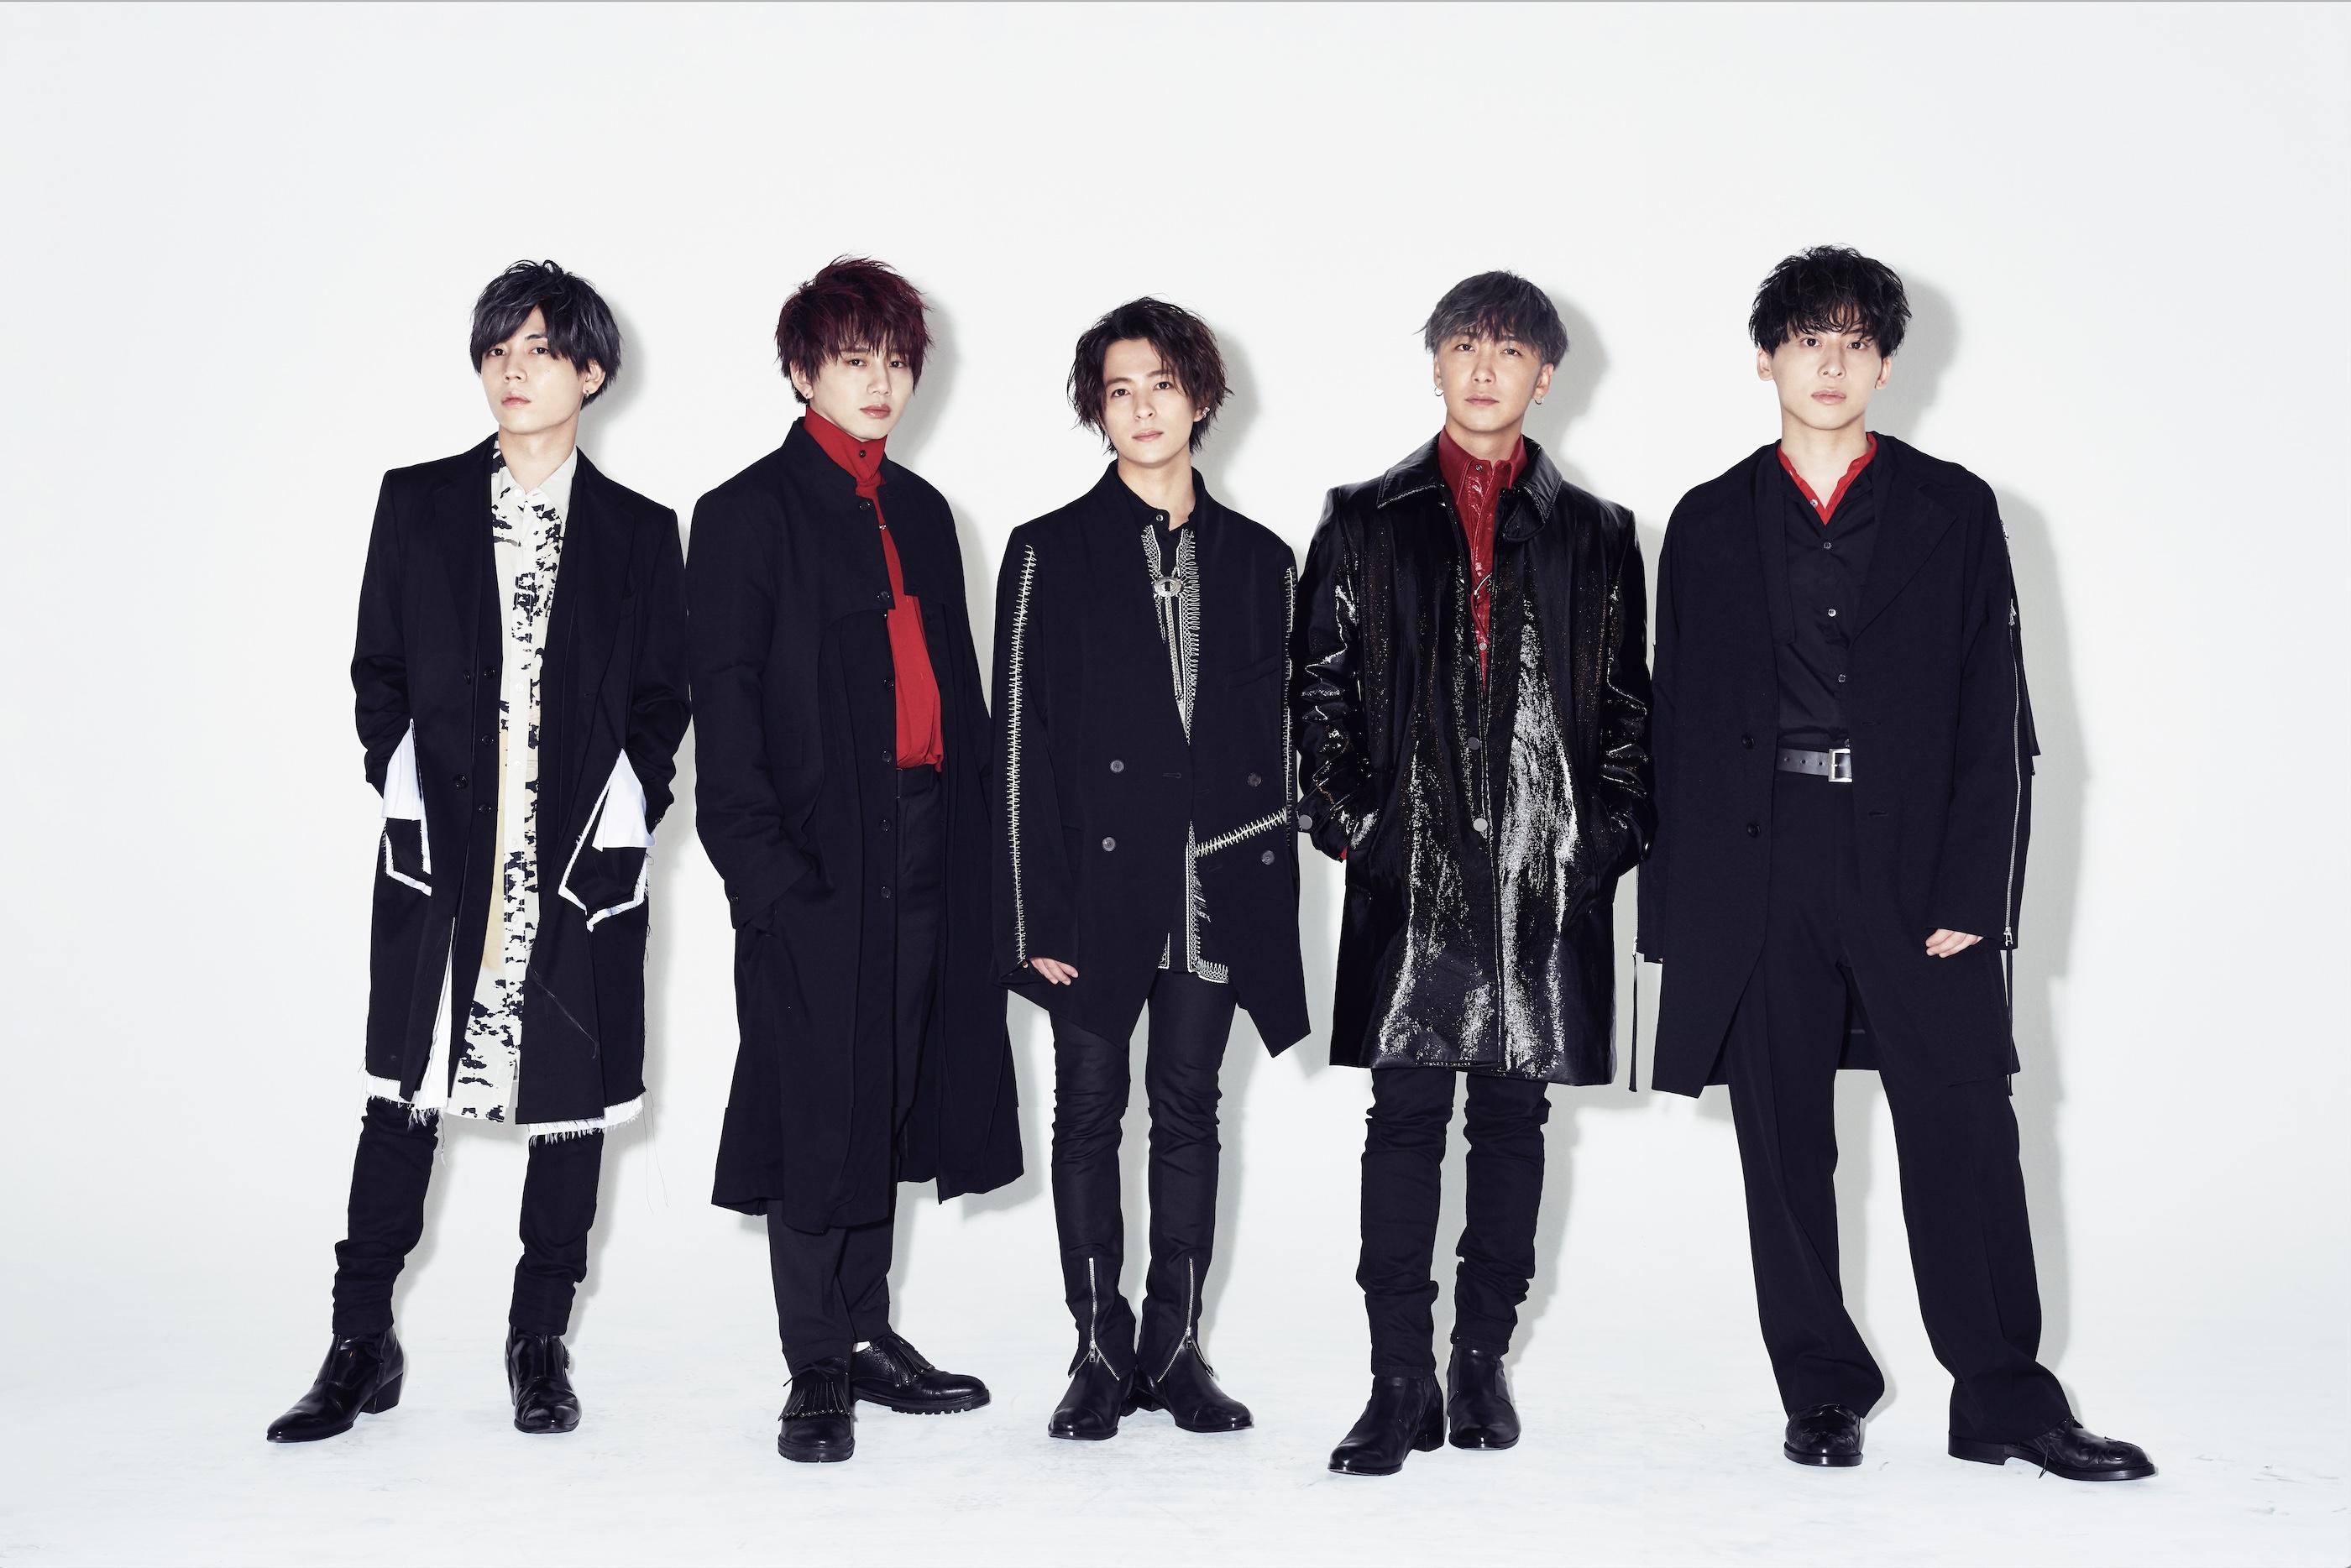 Da-iCE ARENA TOUR 2021 -SiX- 横浜公演2日目(昼) 当日券予約